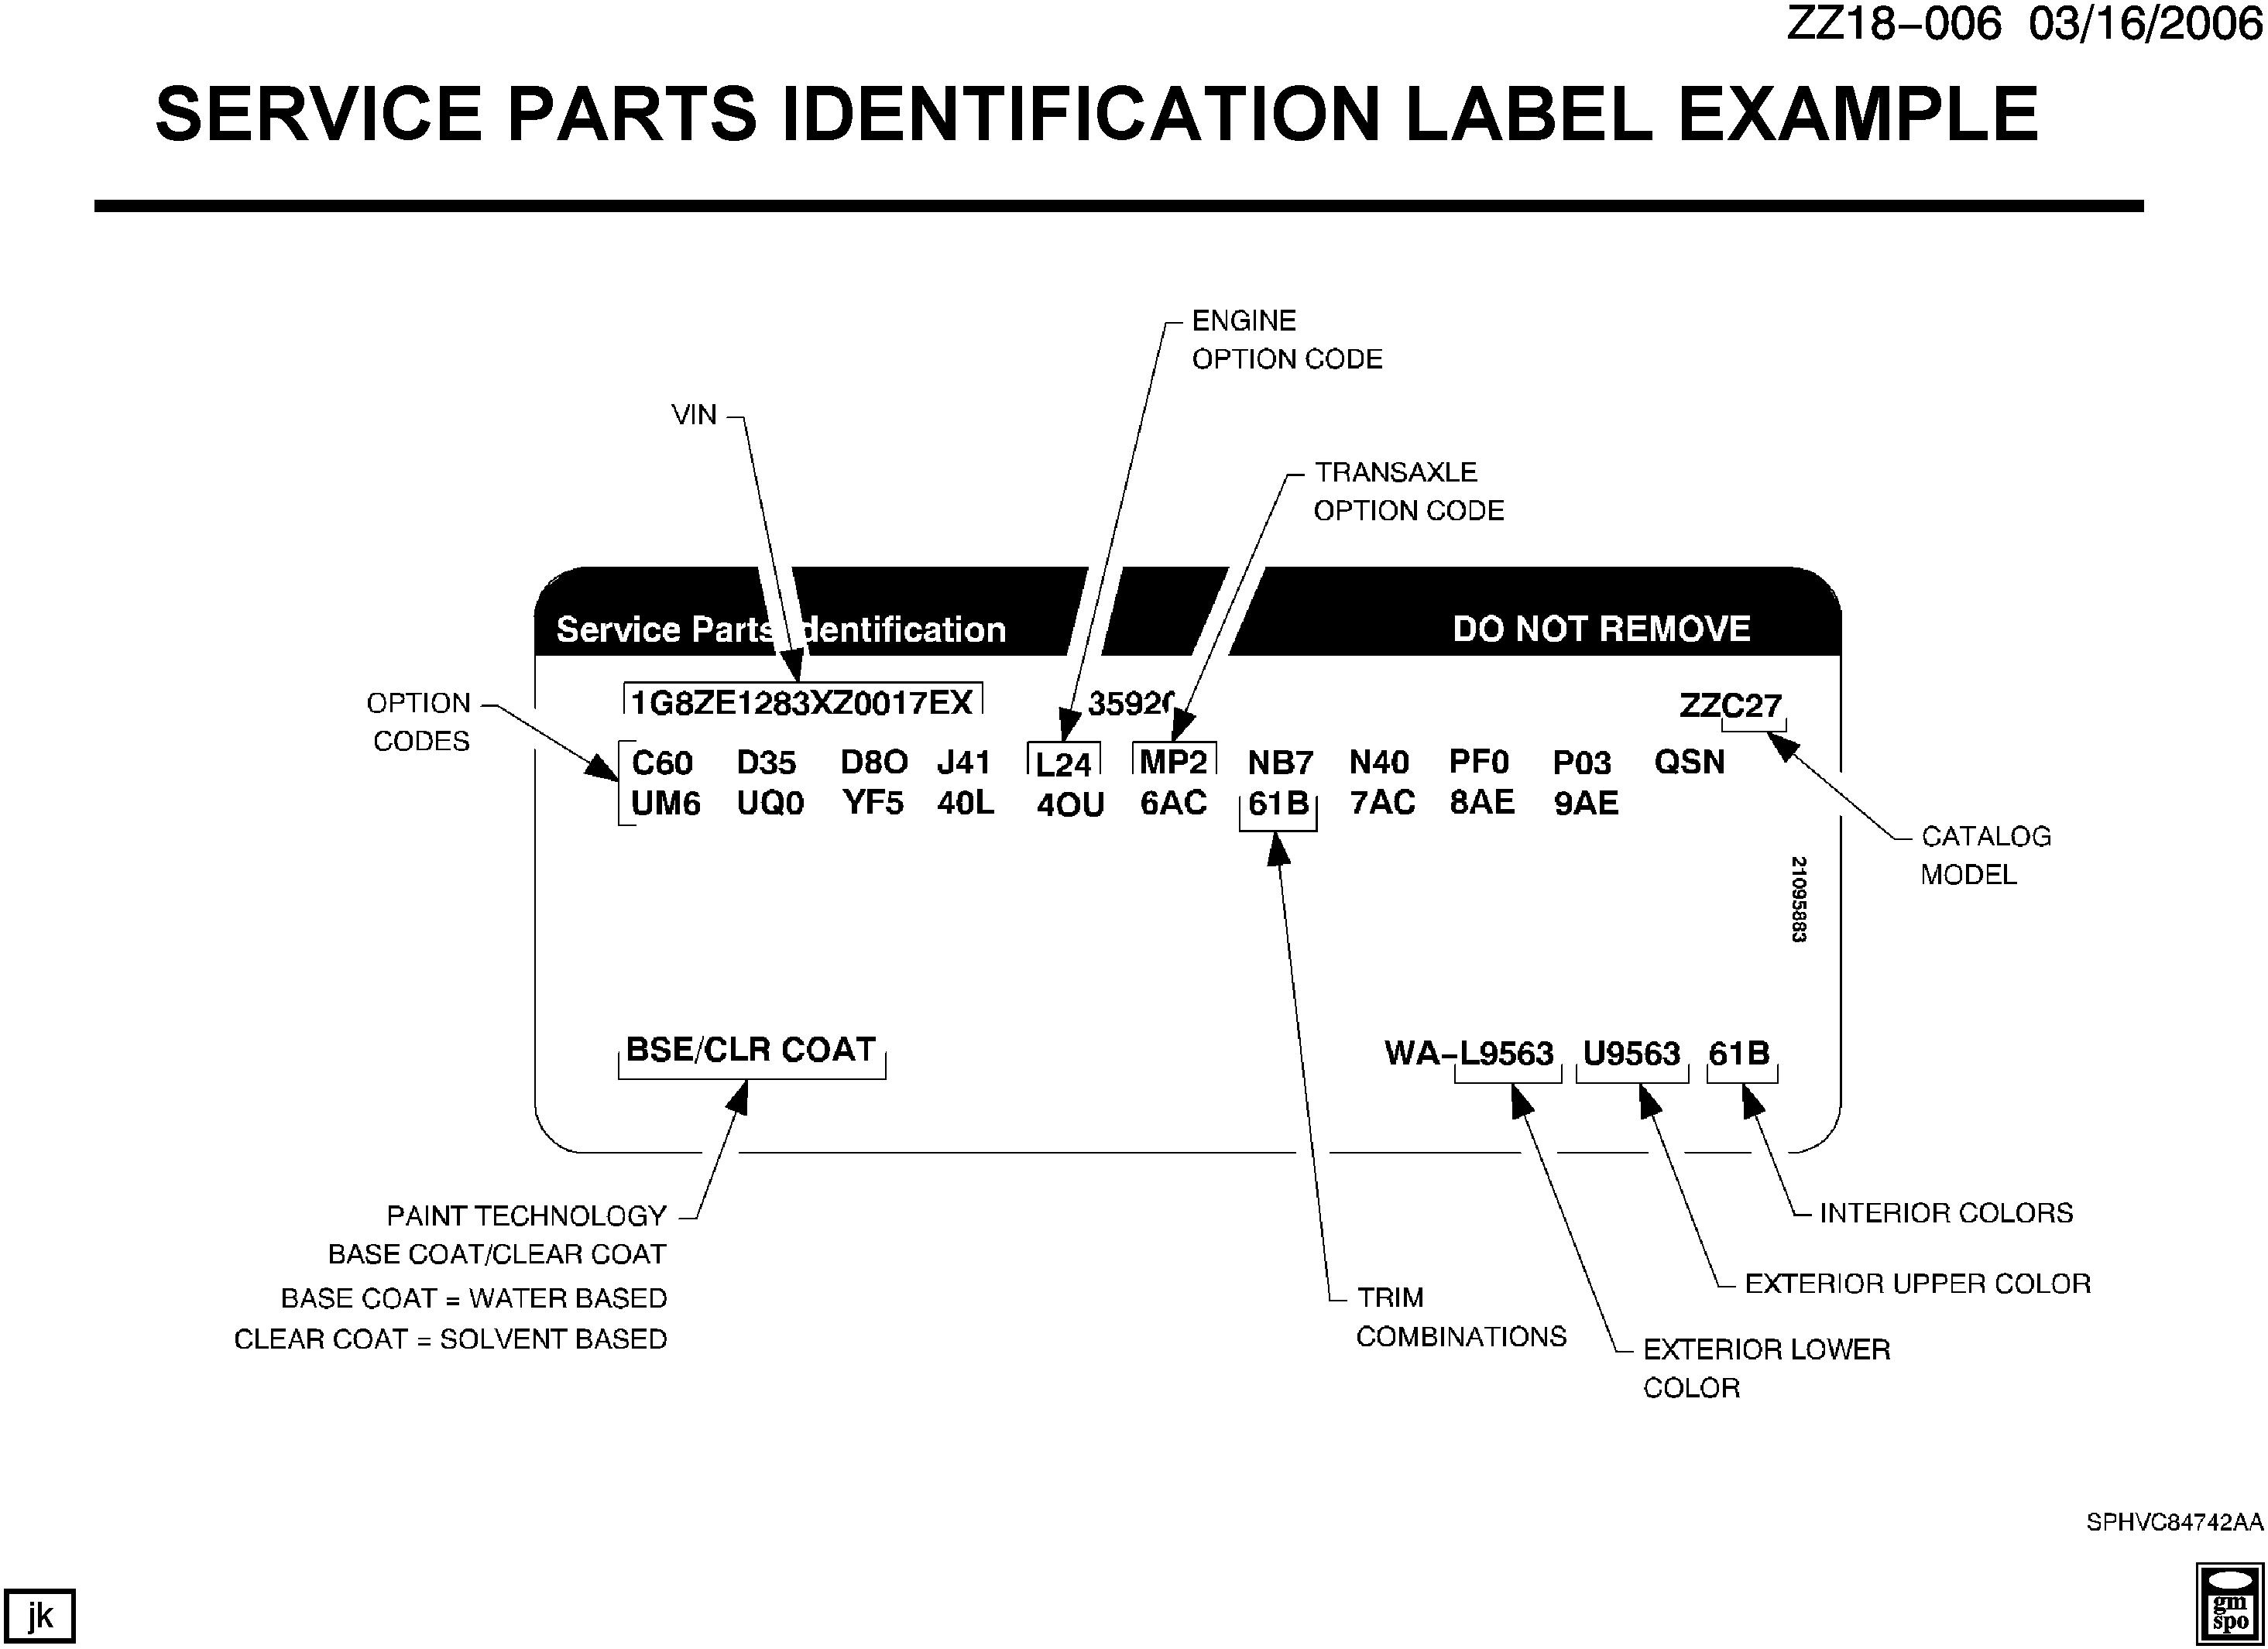 Saturn S Series Z Service Parts Identification Label Example Epc L24 Engine Diagram Spare Catalog